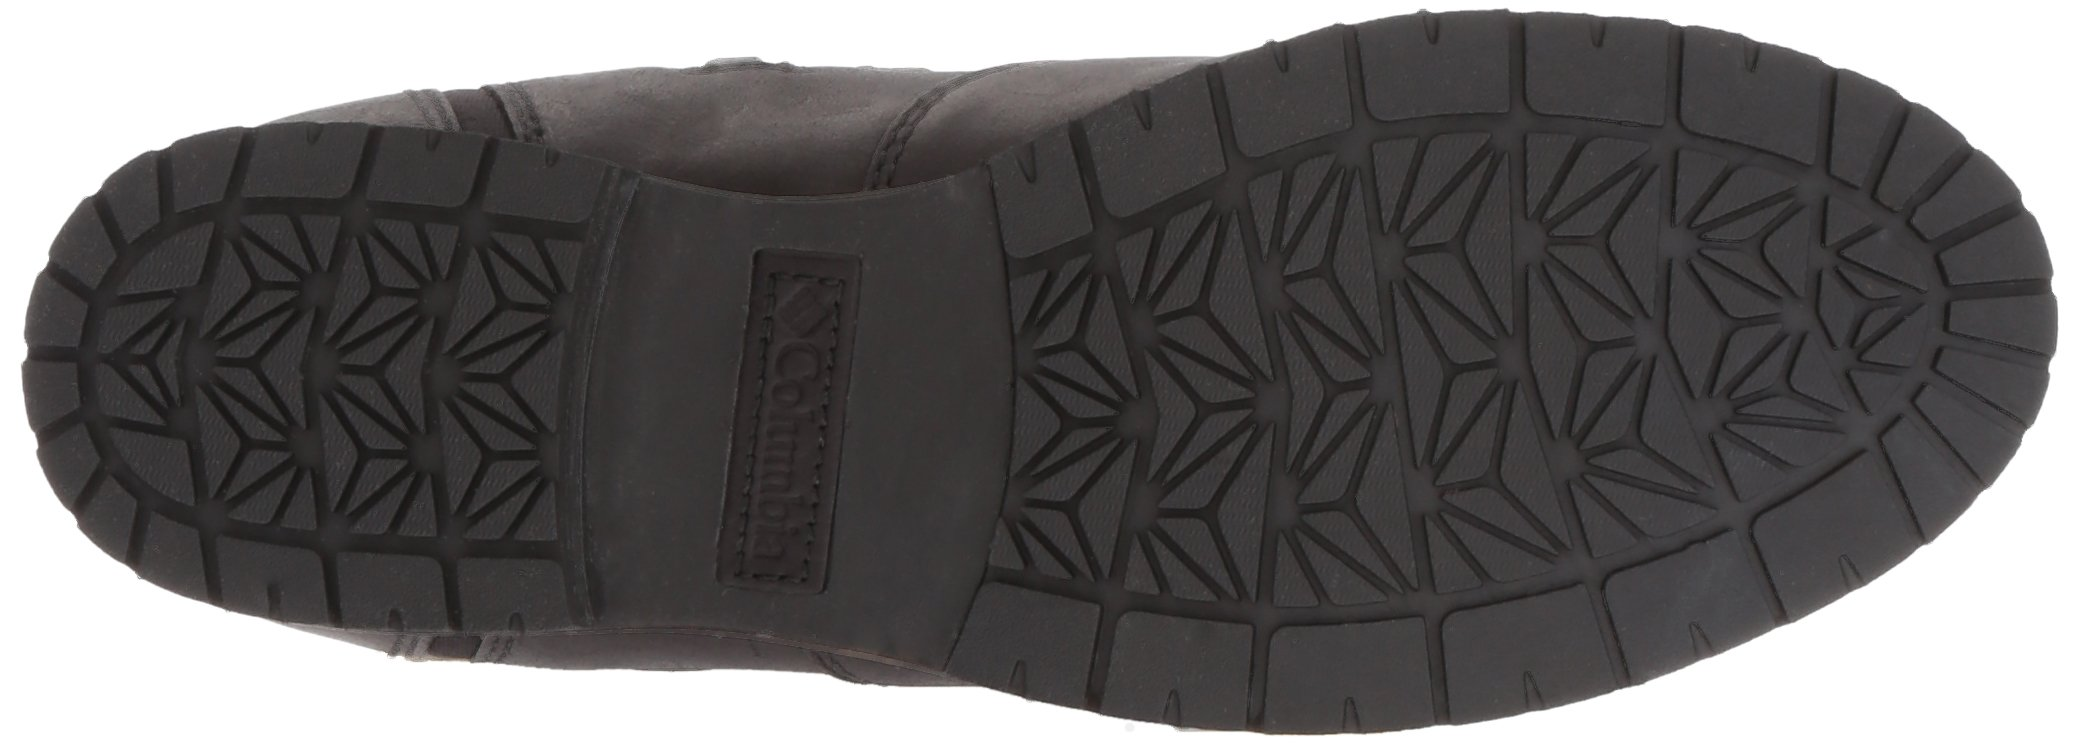 Columbia Women's Twentythird Ave Waterproof Tall Boot Uniform Dress Shoe, Black, Mud, 9 B US by Columbia (Image #3)